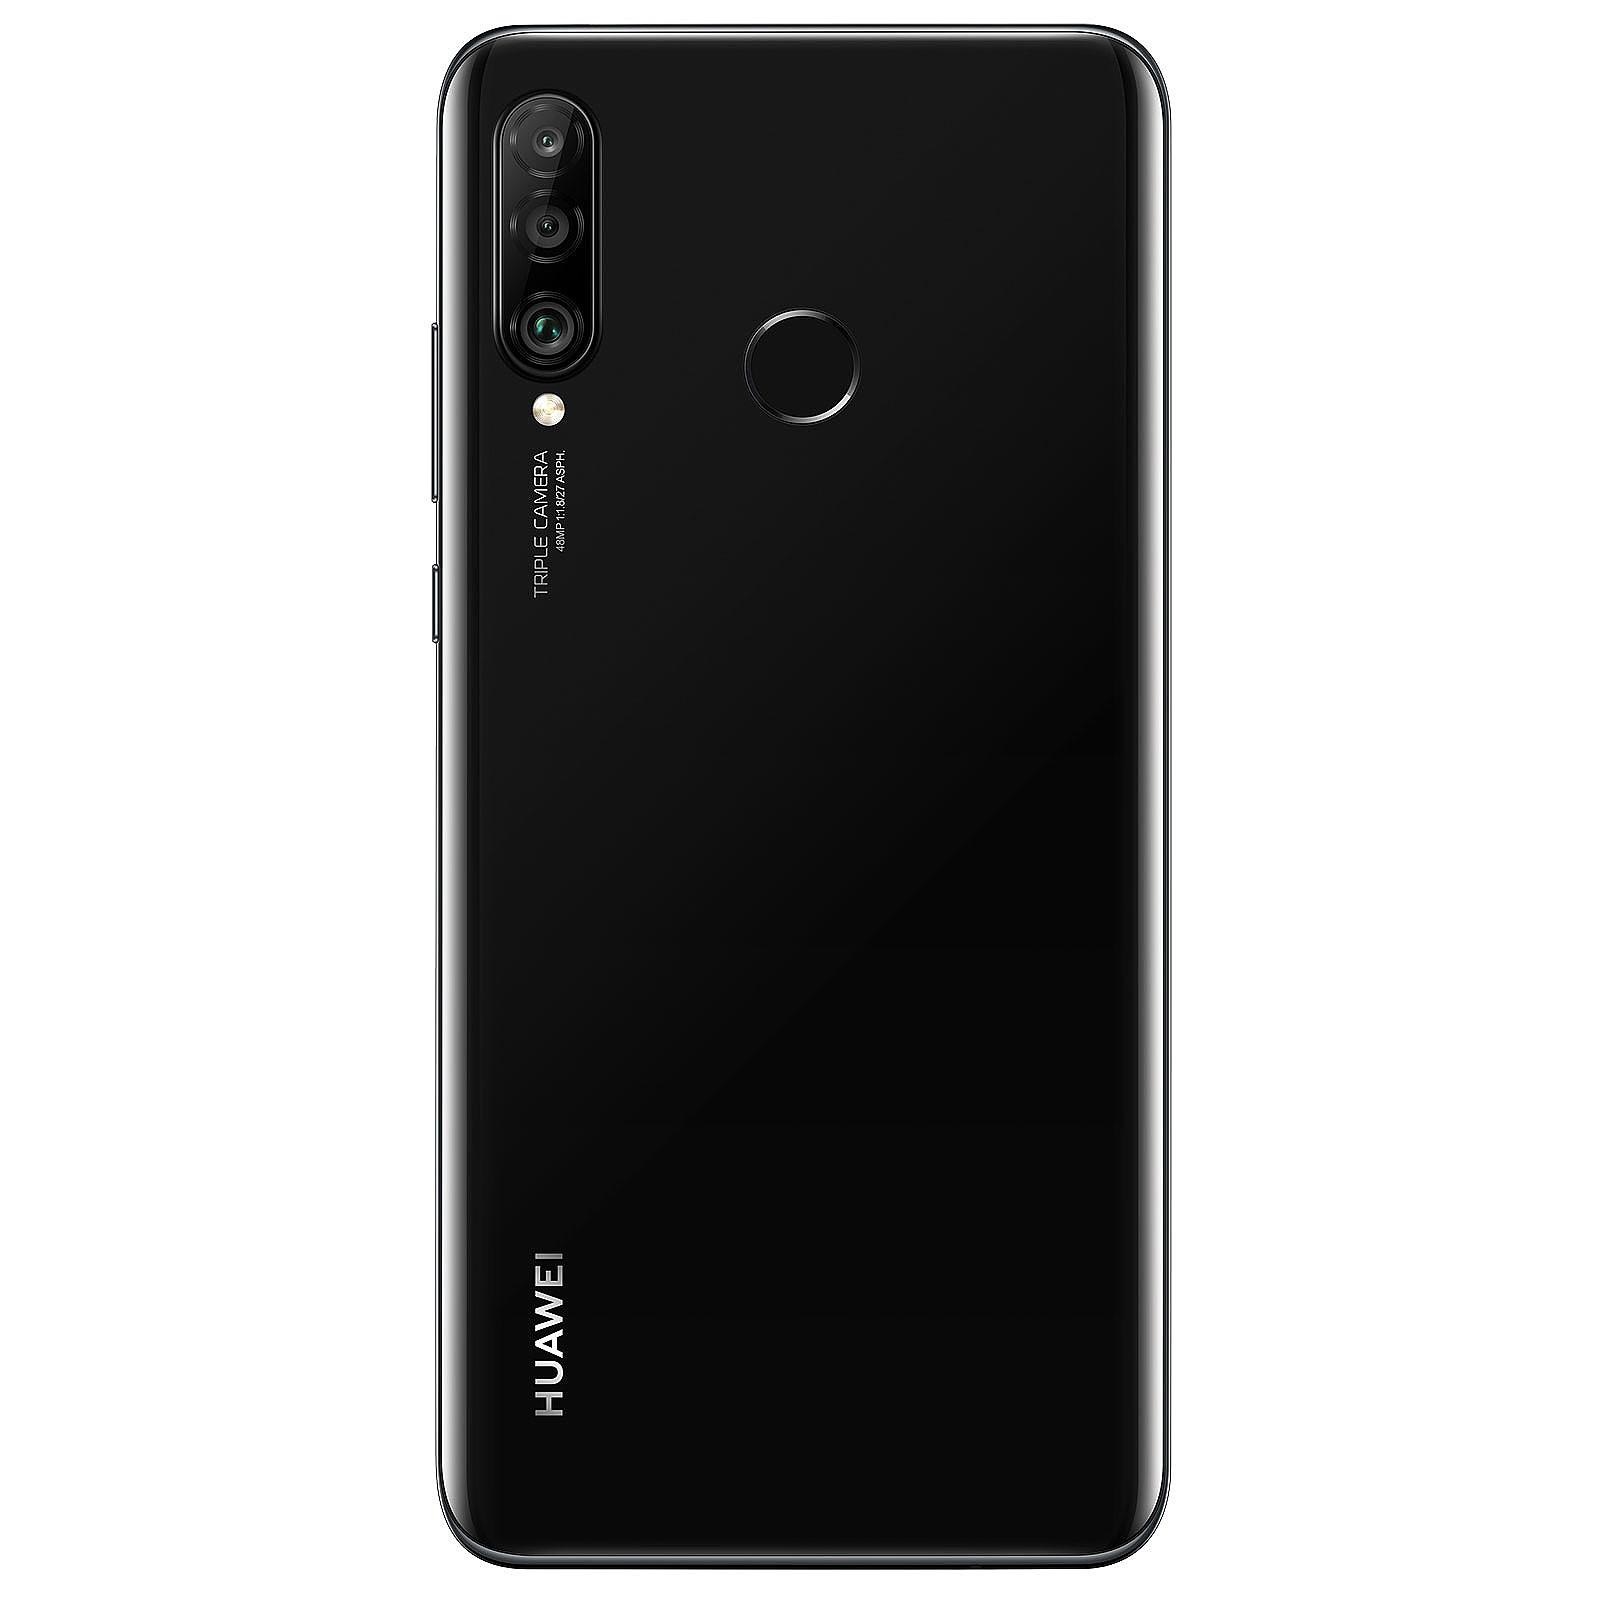 Huawei P30 Lite 128Go Black - Téléphonie Huawei - Cybertek.fr - 4